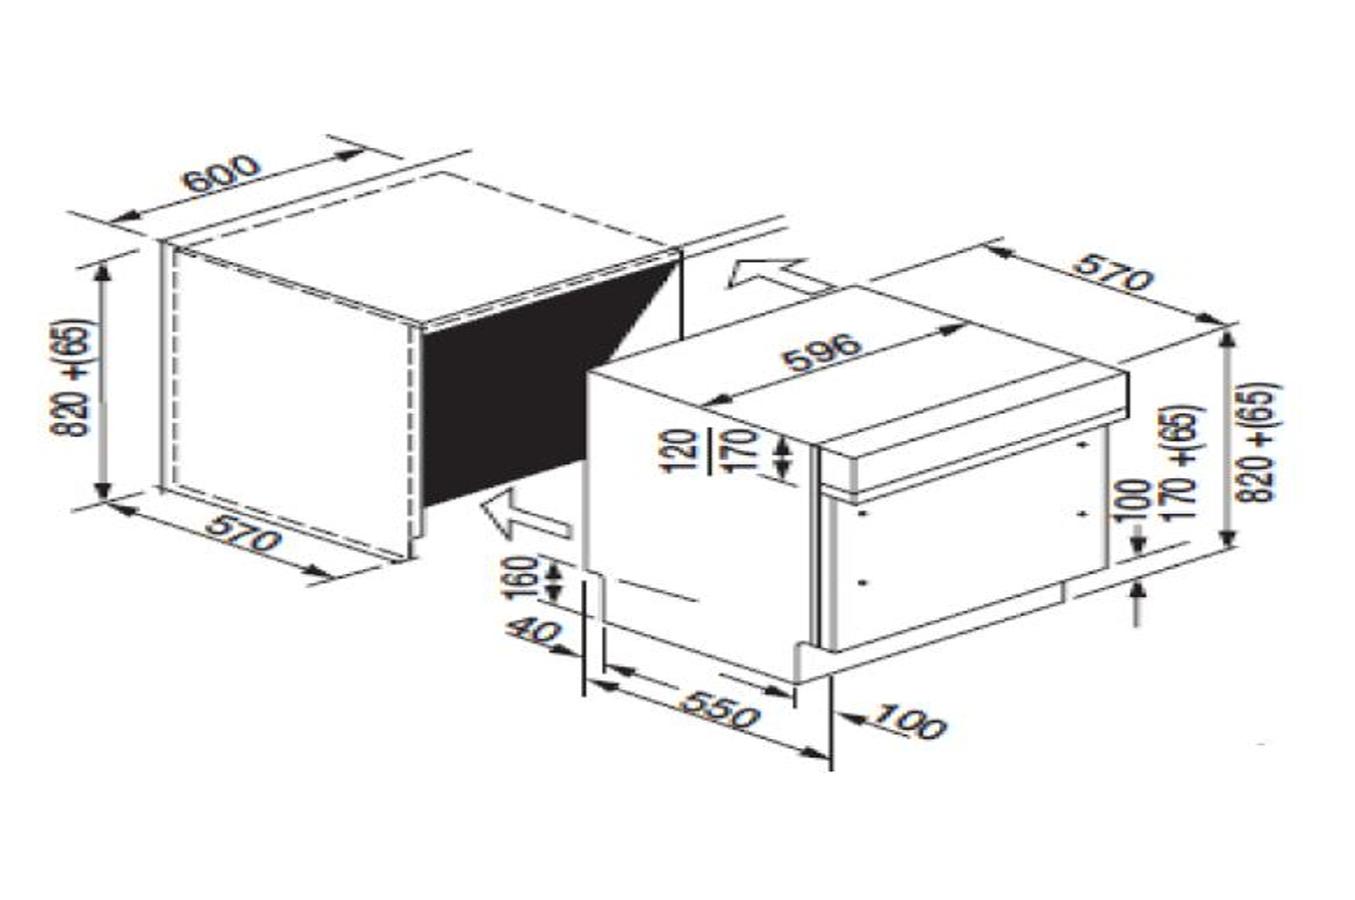 lave vaisselle encastrable rosieres rli1d63x inox 4222202. Black Bedroom Furniture Sets. Home Design Ideas